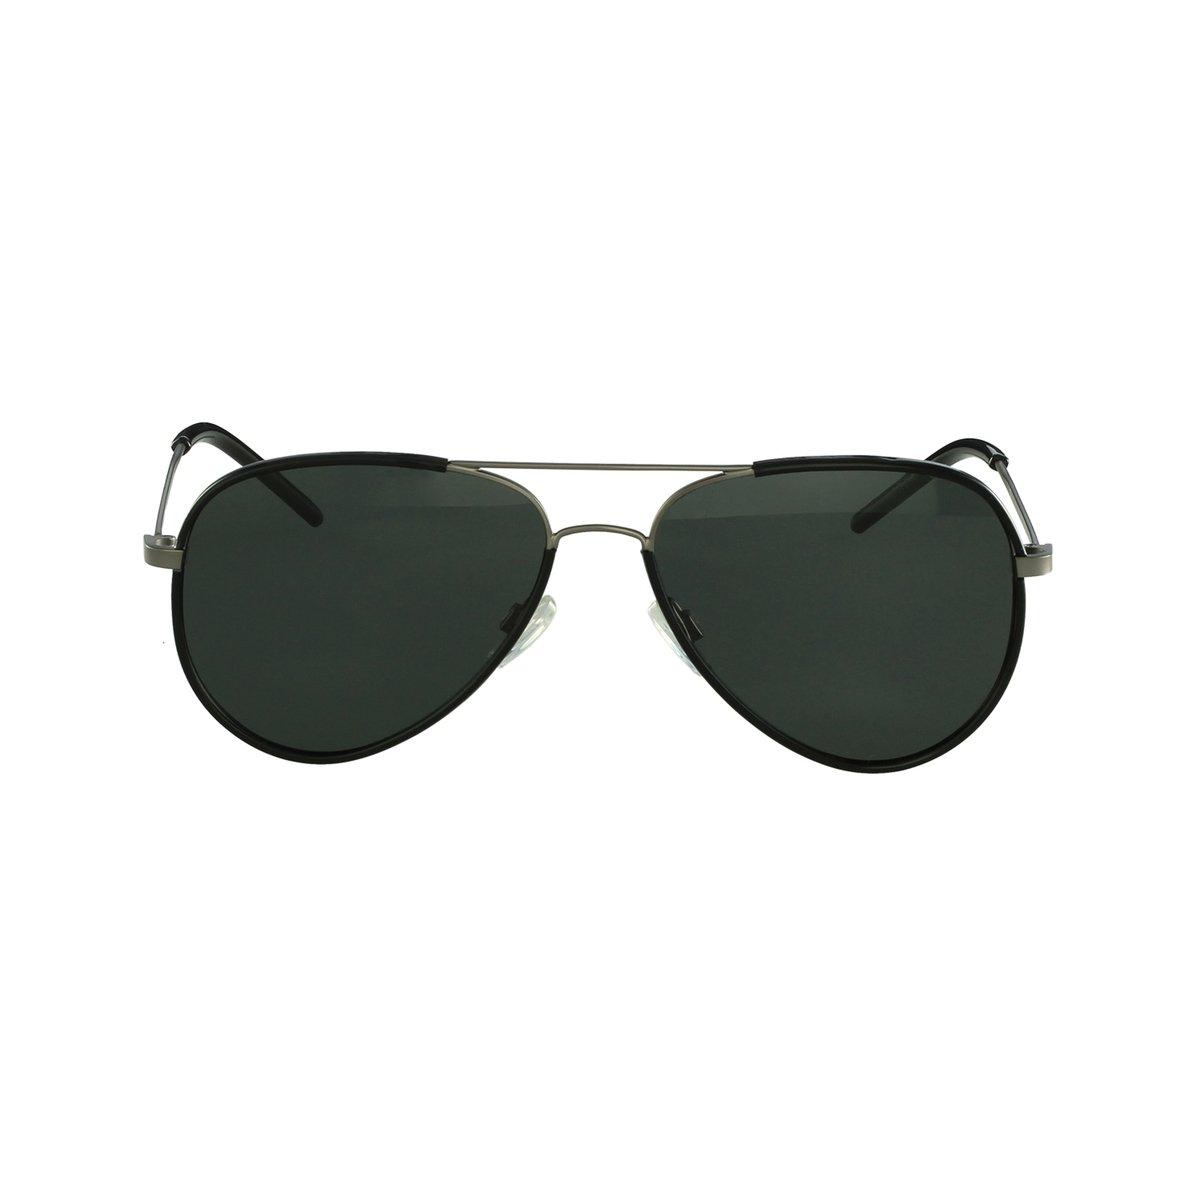 Óculos De Sol Polaroid Aviador - Compre Agora   Zattini 668f771d24